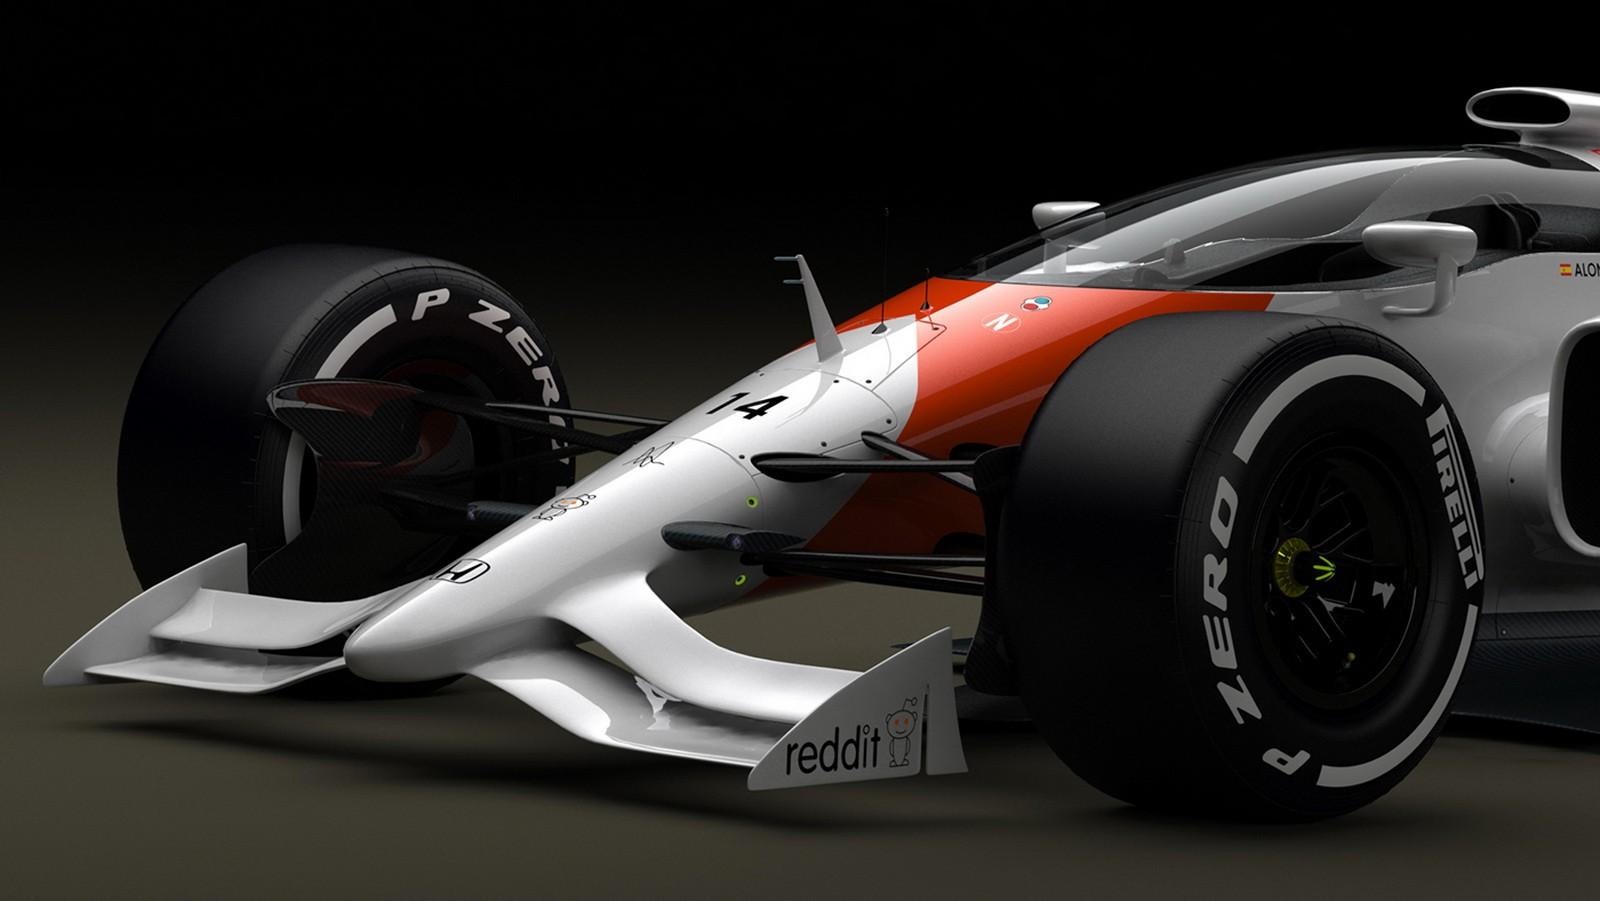 future-formula-1-concept-earns-closed-cockpit-honda-mclaren-livery-photo-gallery_4